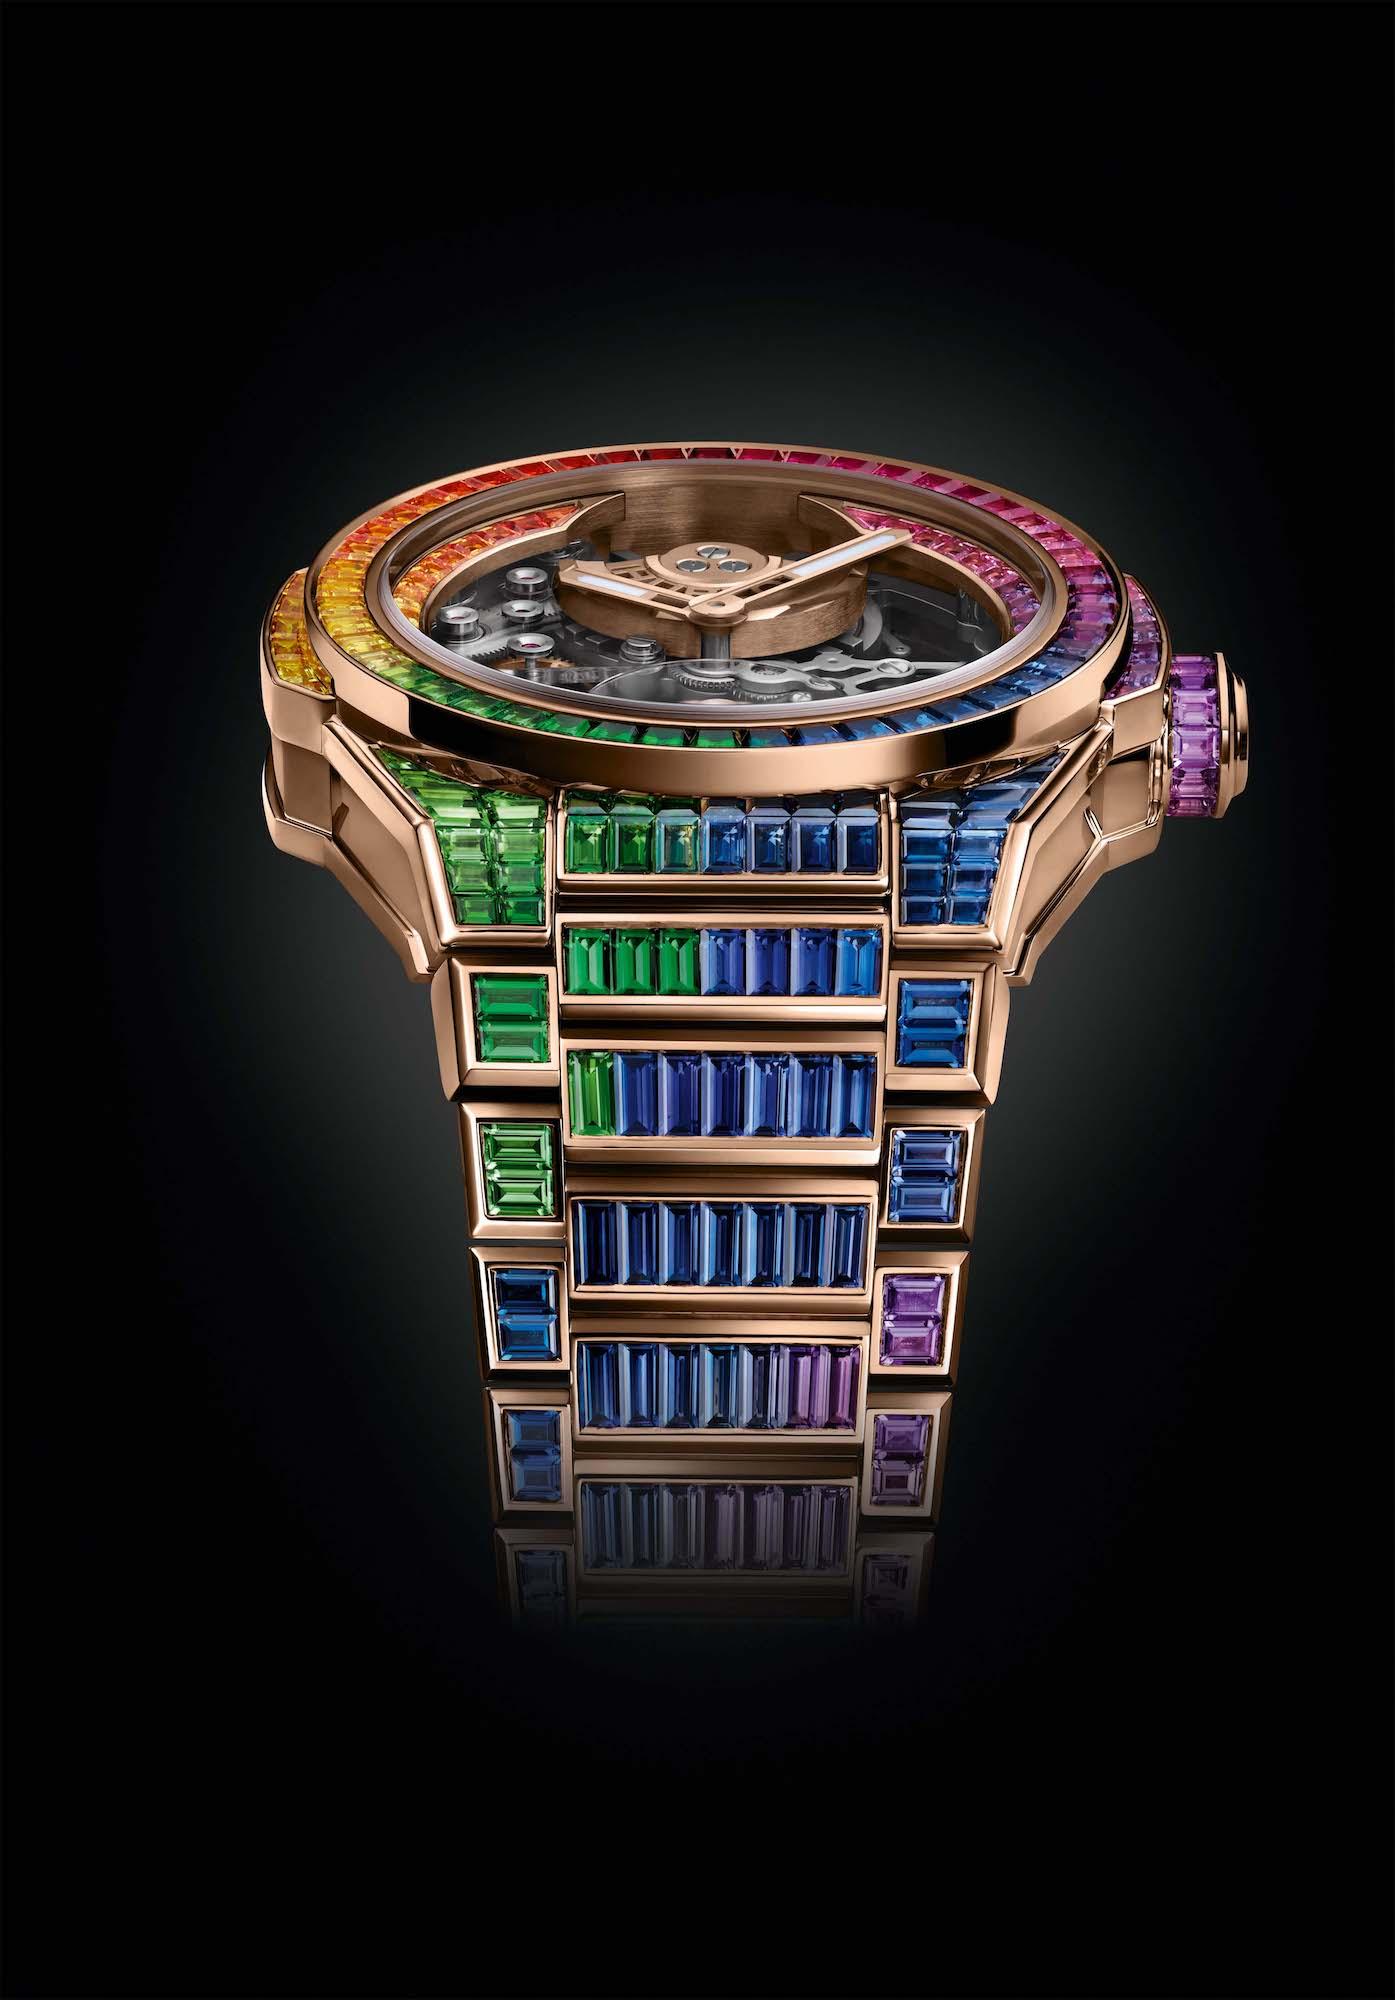 Hublot Big Bang Integral Tourbillon Rainbow 455.OX.9900.OX.9999 Detalle